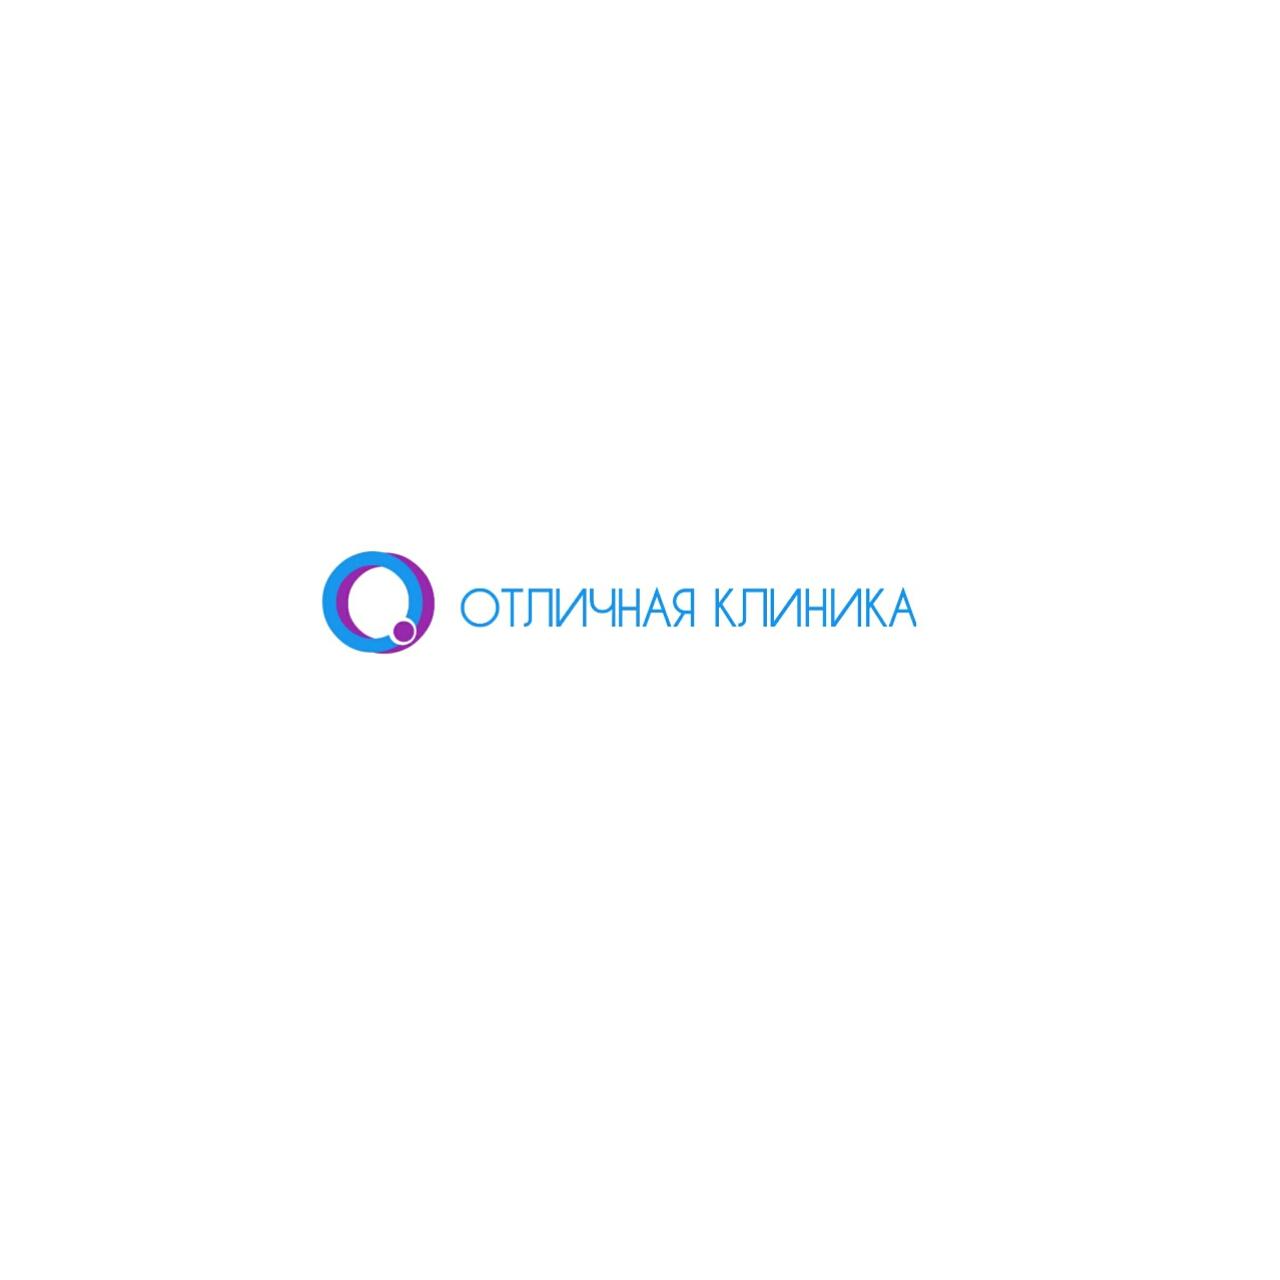 Логотип и фирменный стиль частной клиники фото f_3425c8cb7a8b0bcc.jpg